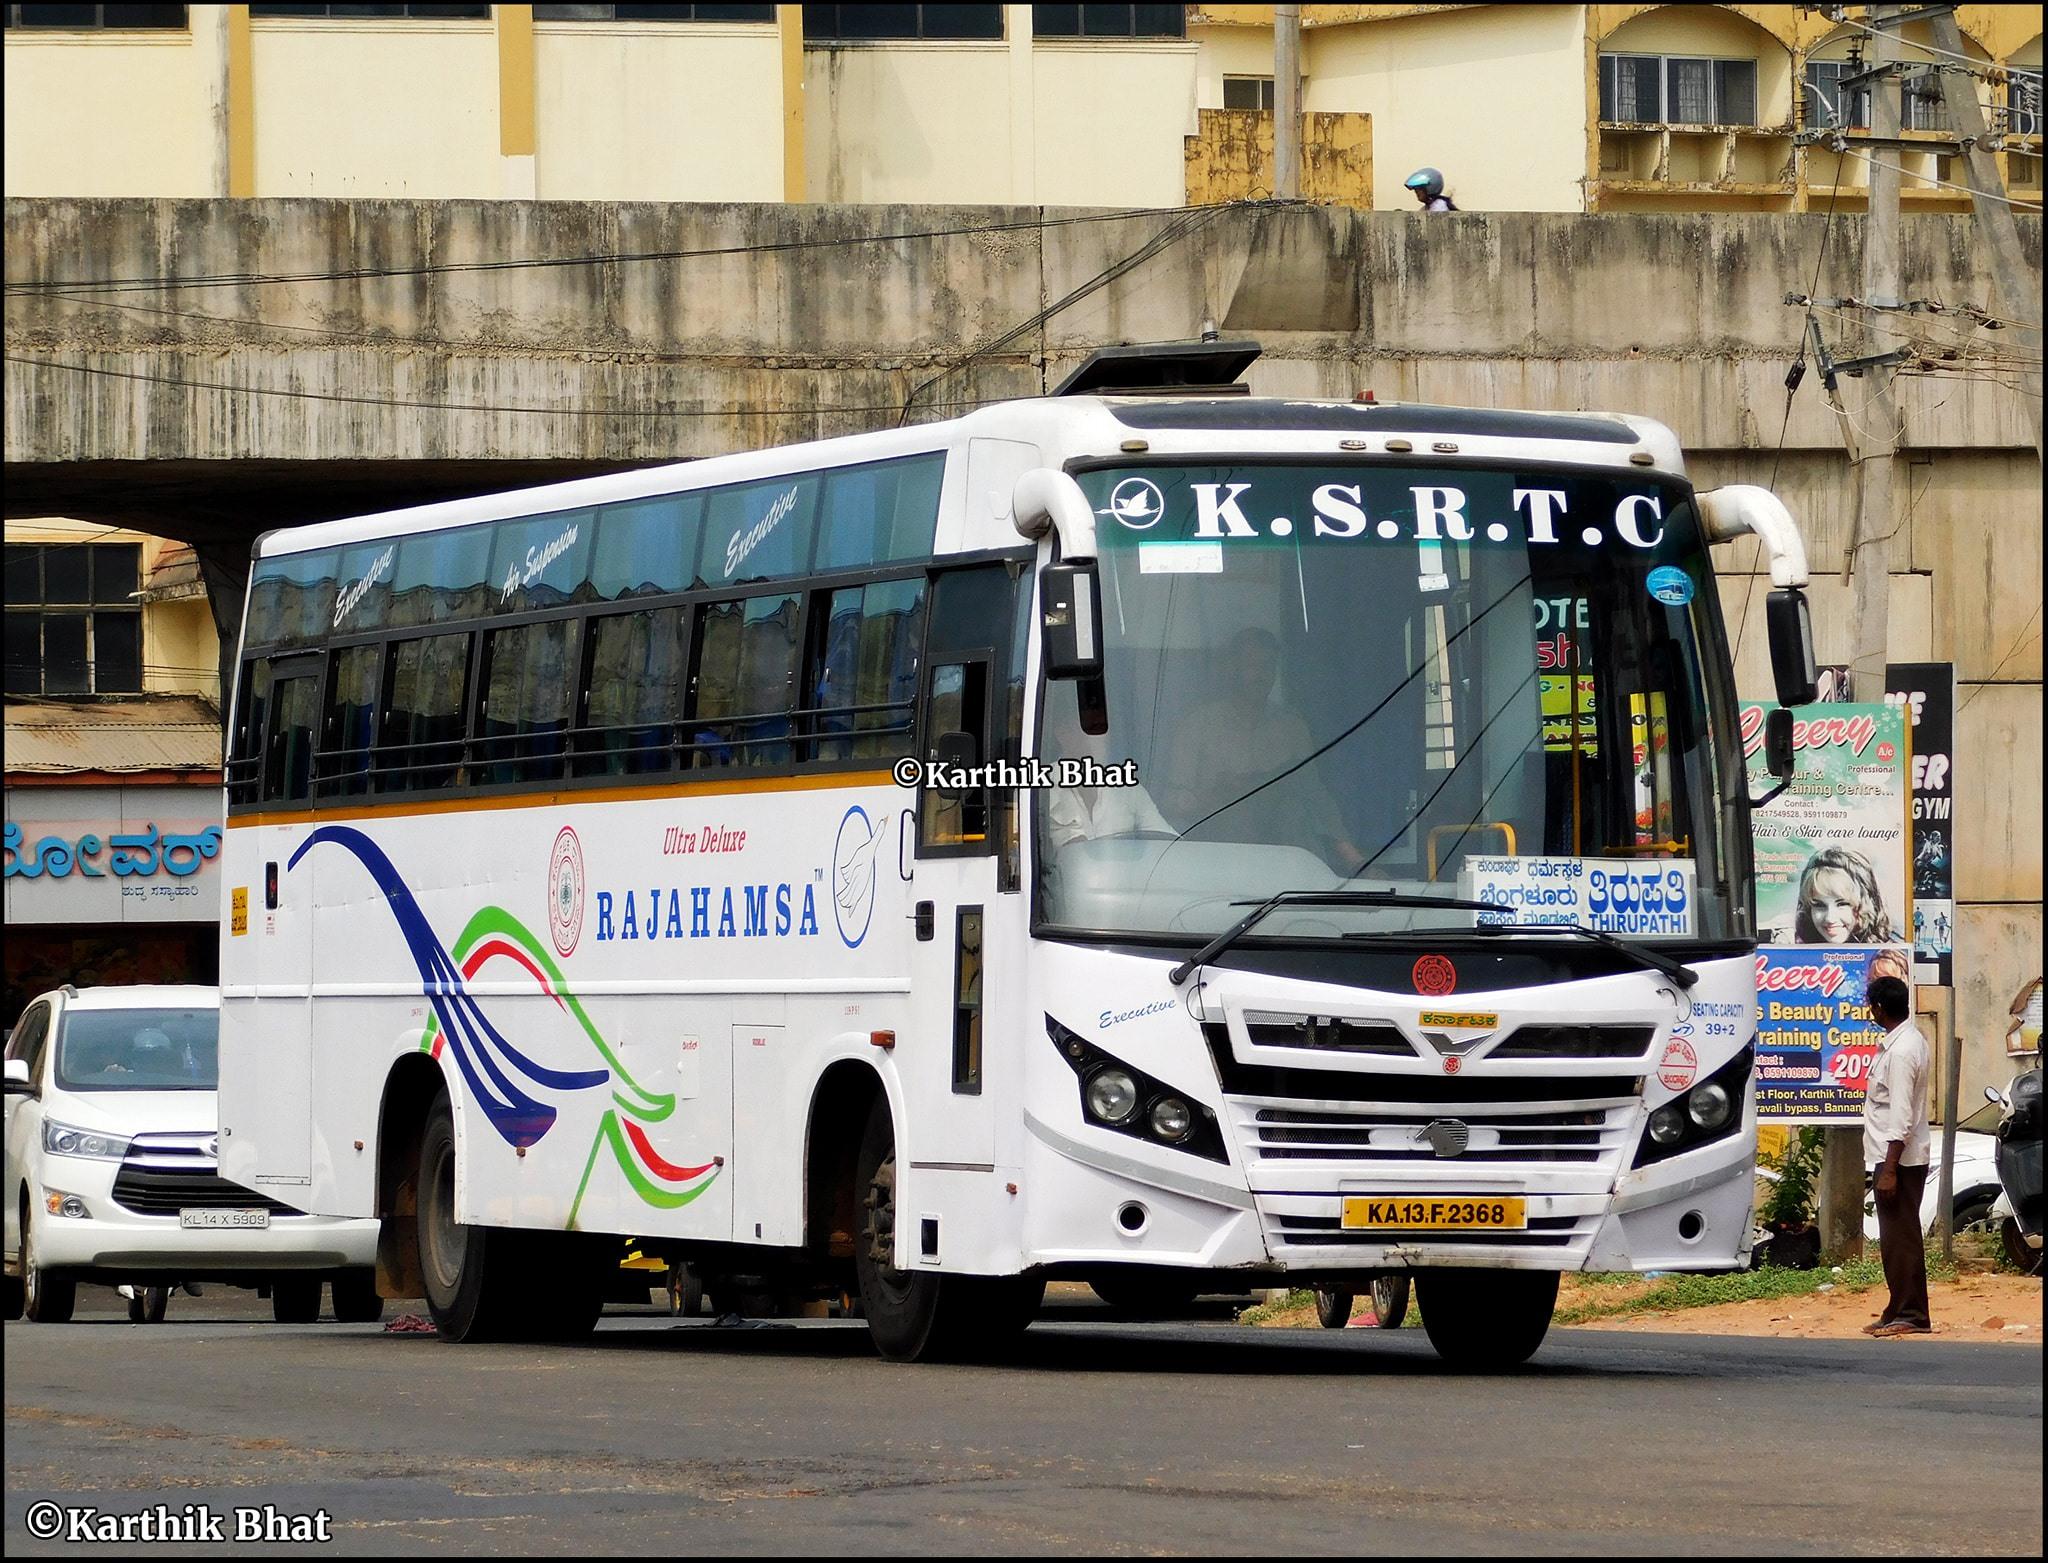 Kannur To Bangalore KSRTC Rajahamsa Executive Onam Special Bus Service